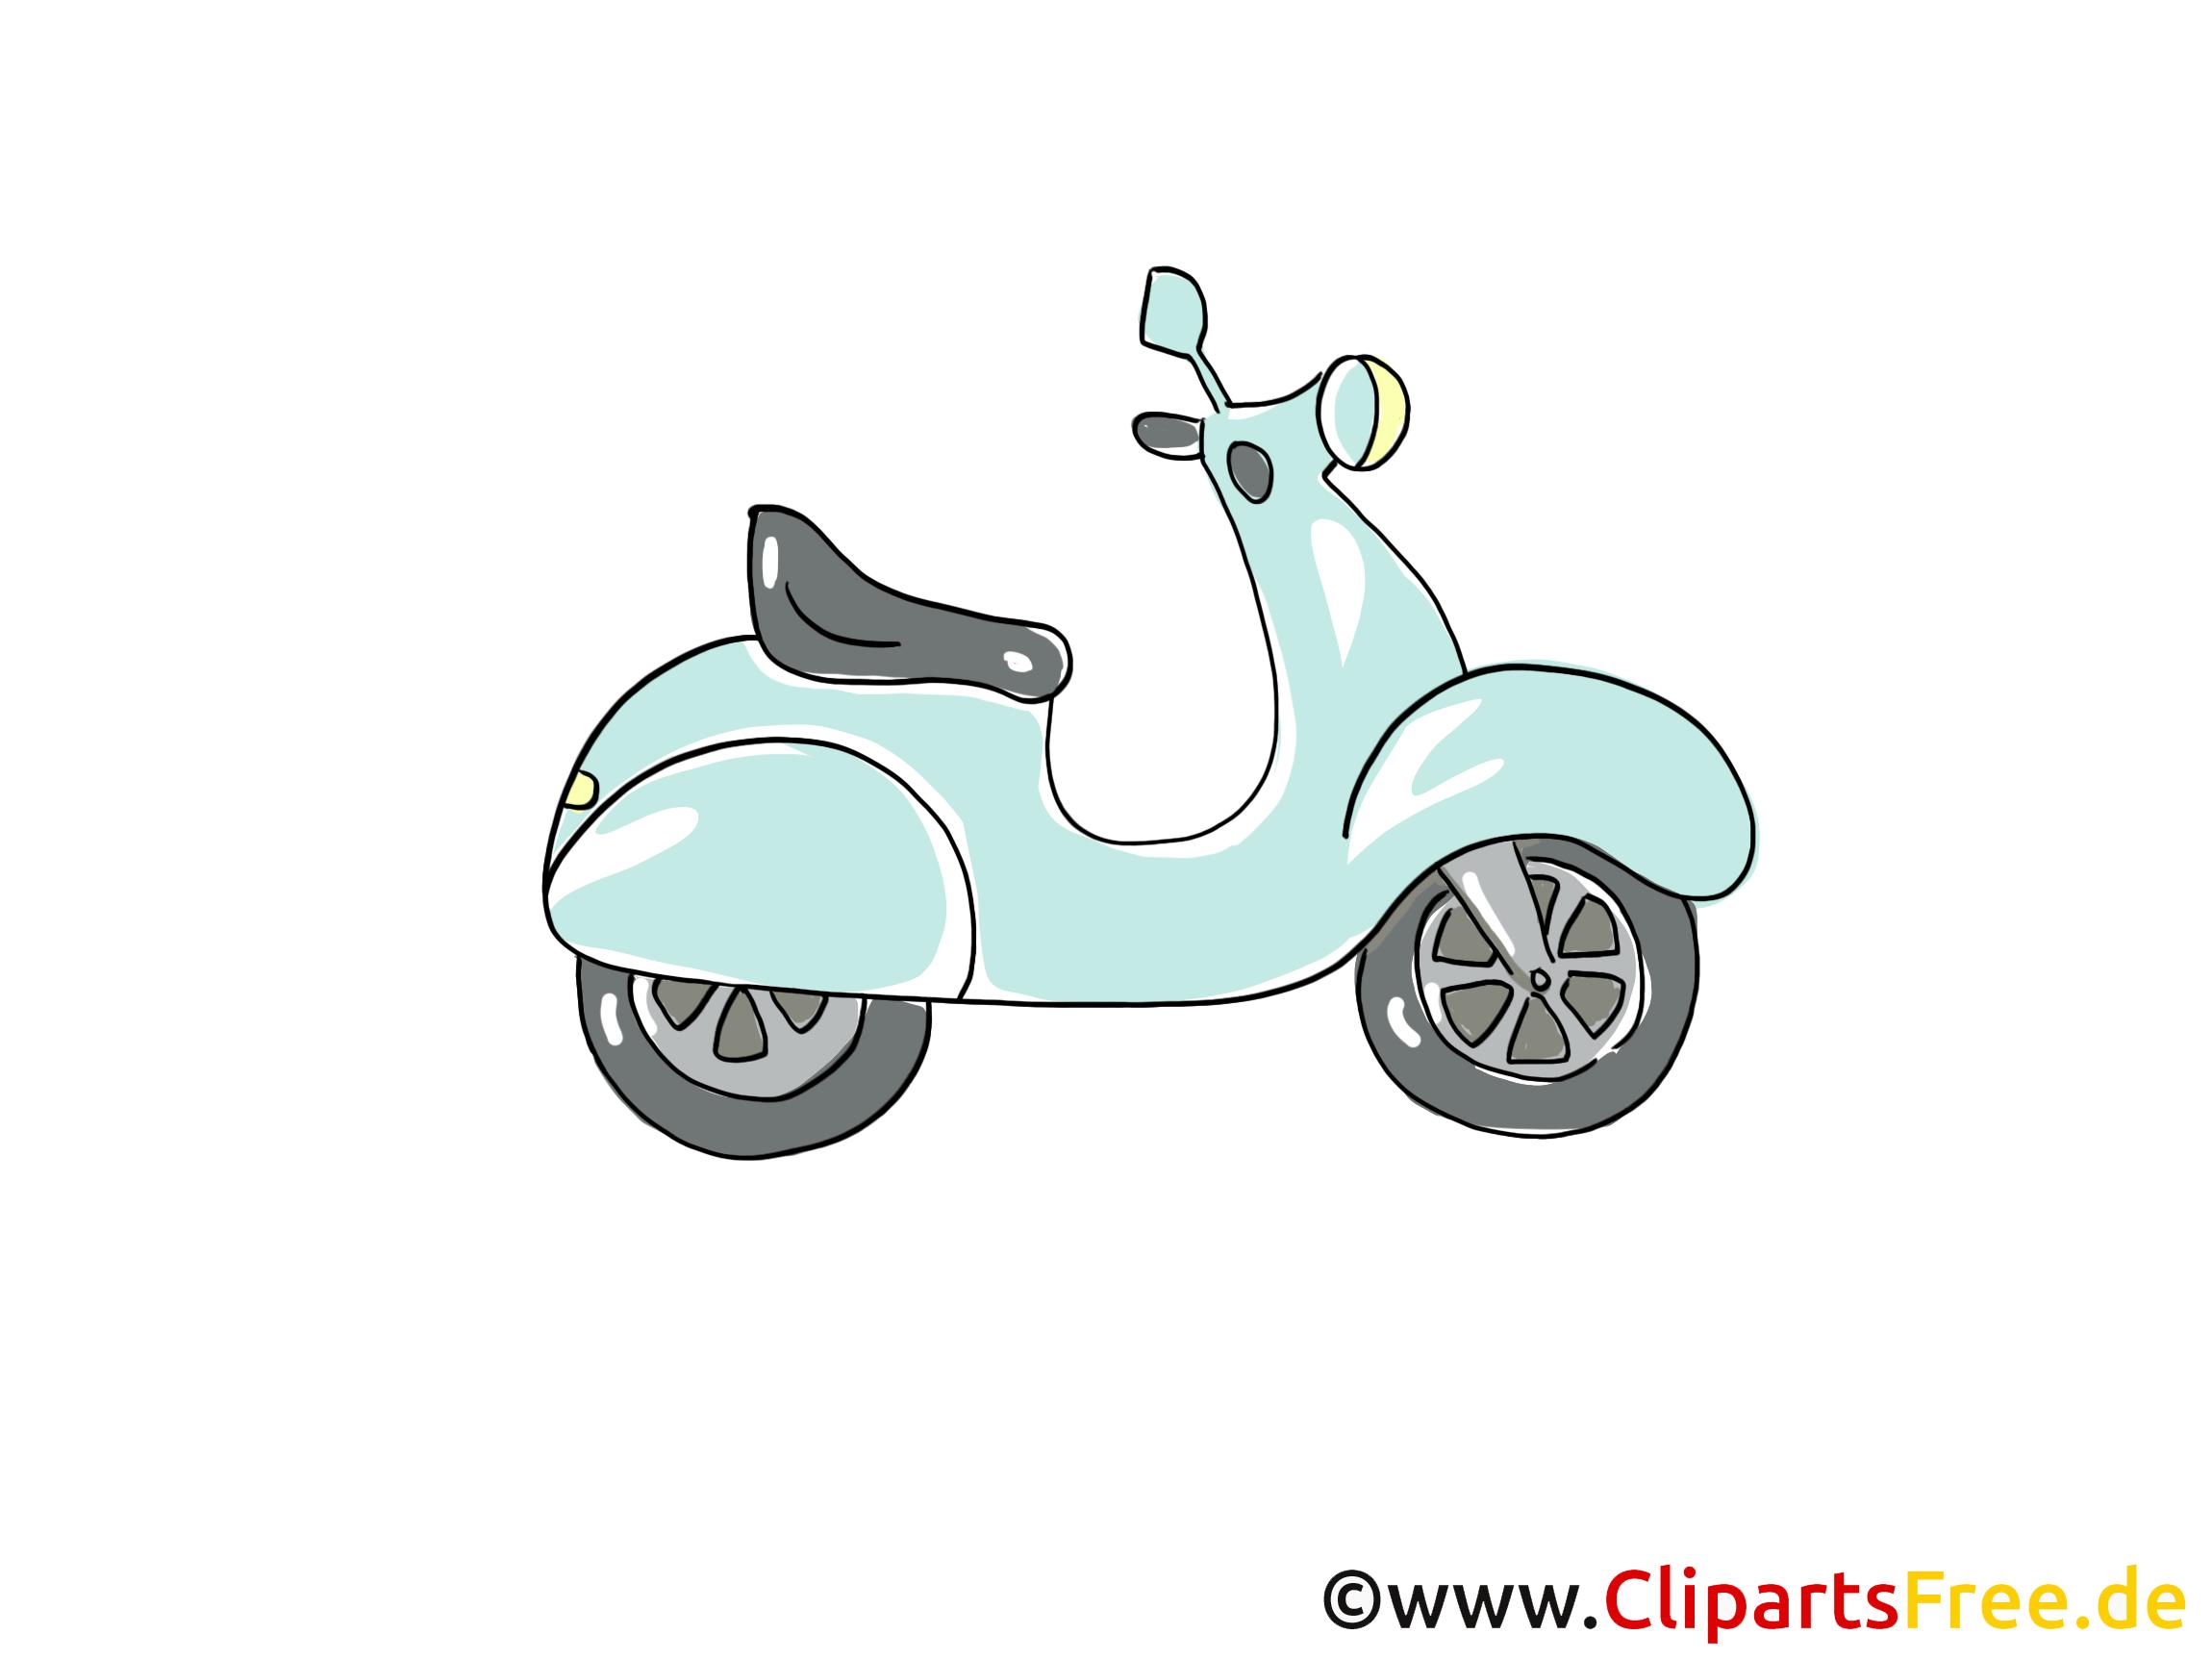 Mofa Clipart, Bild, Cartoon, Comic, Grafik 8307 on Kindergarten Clip Art